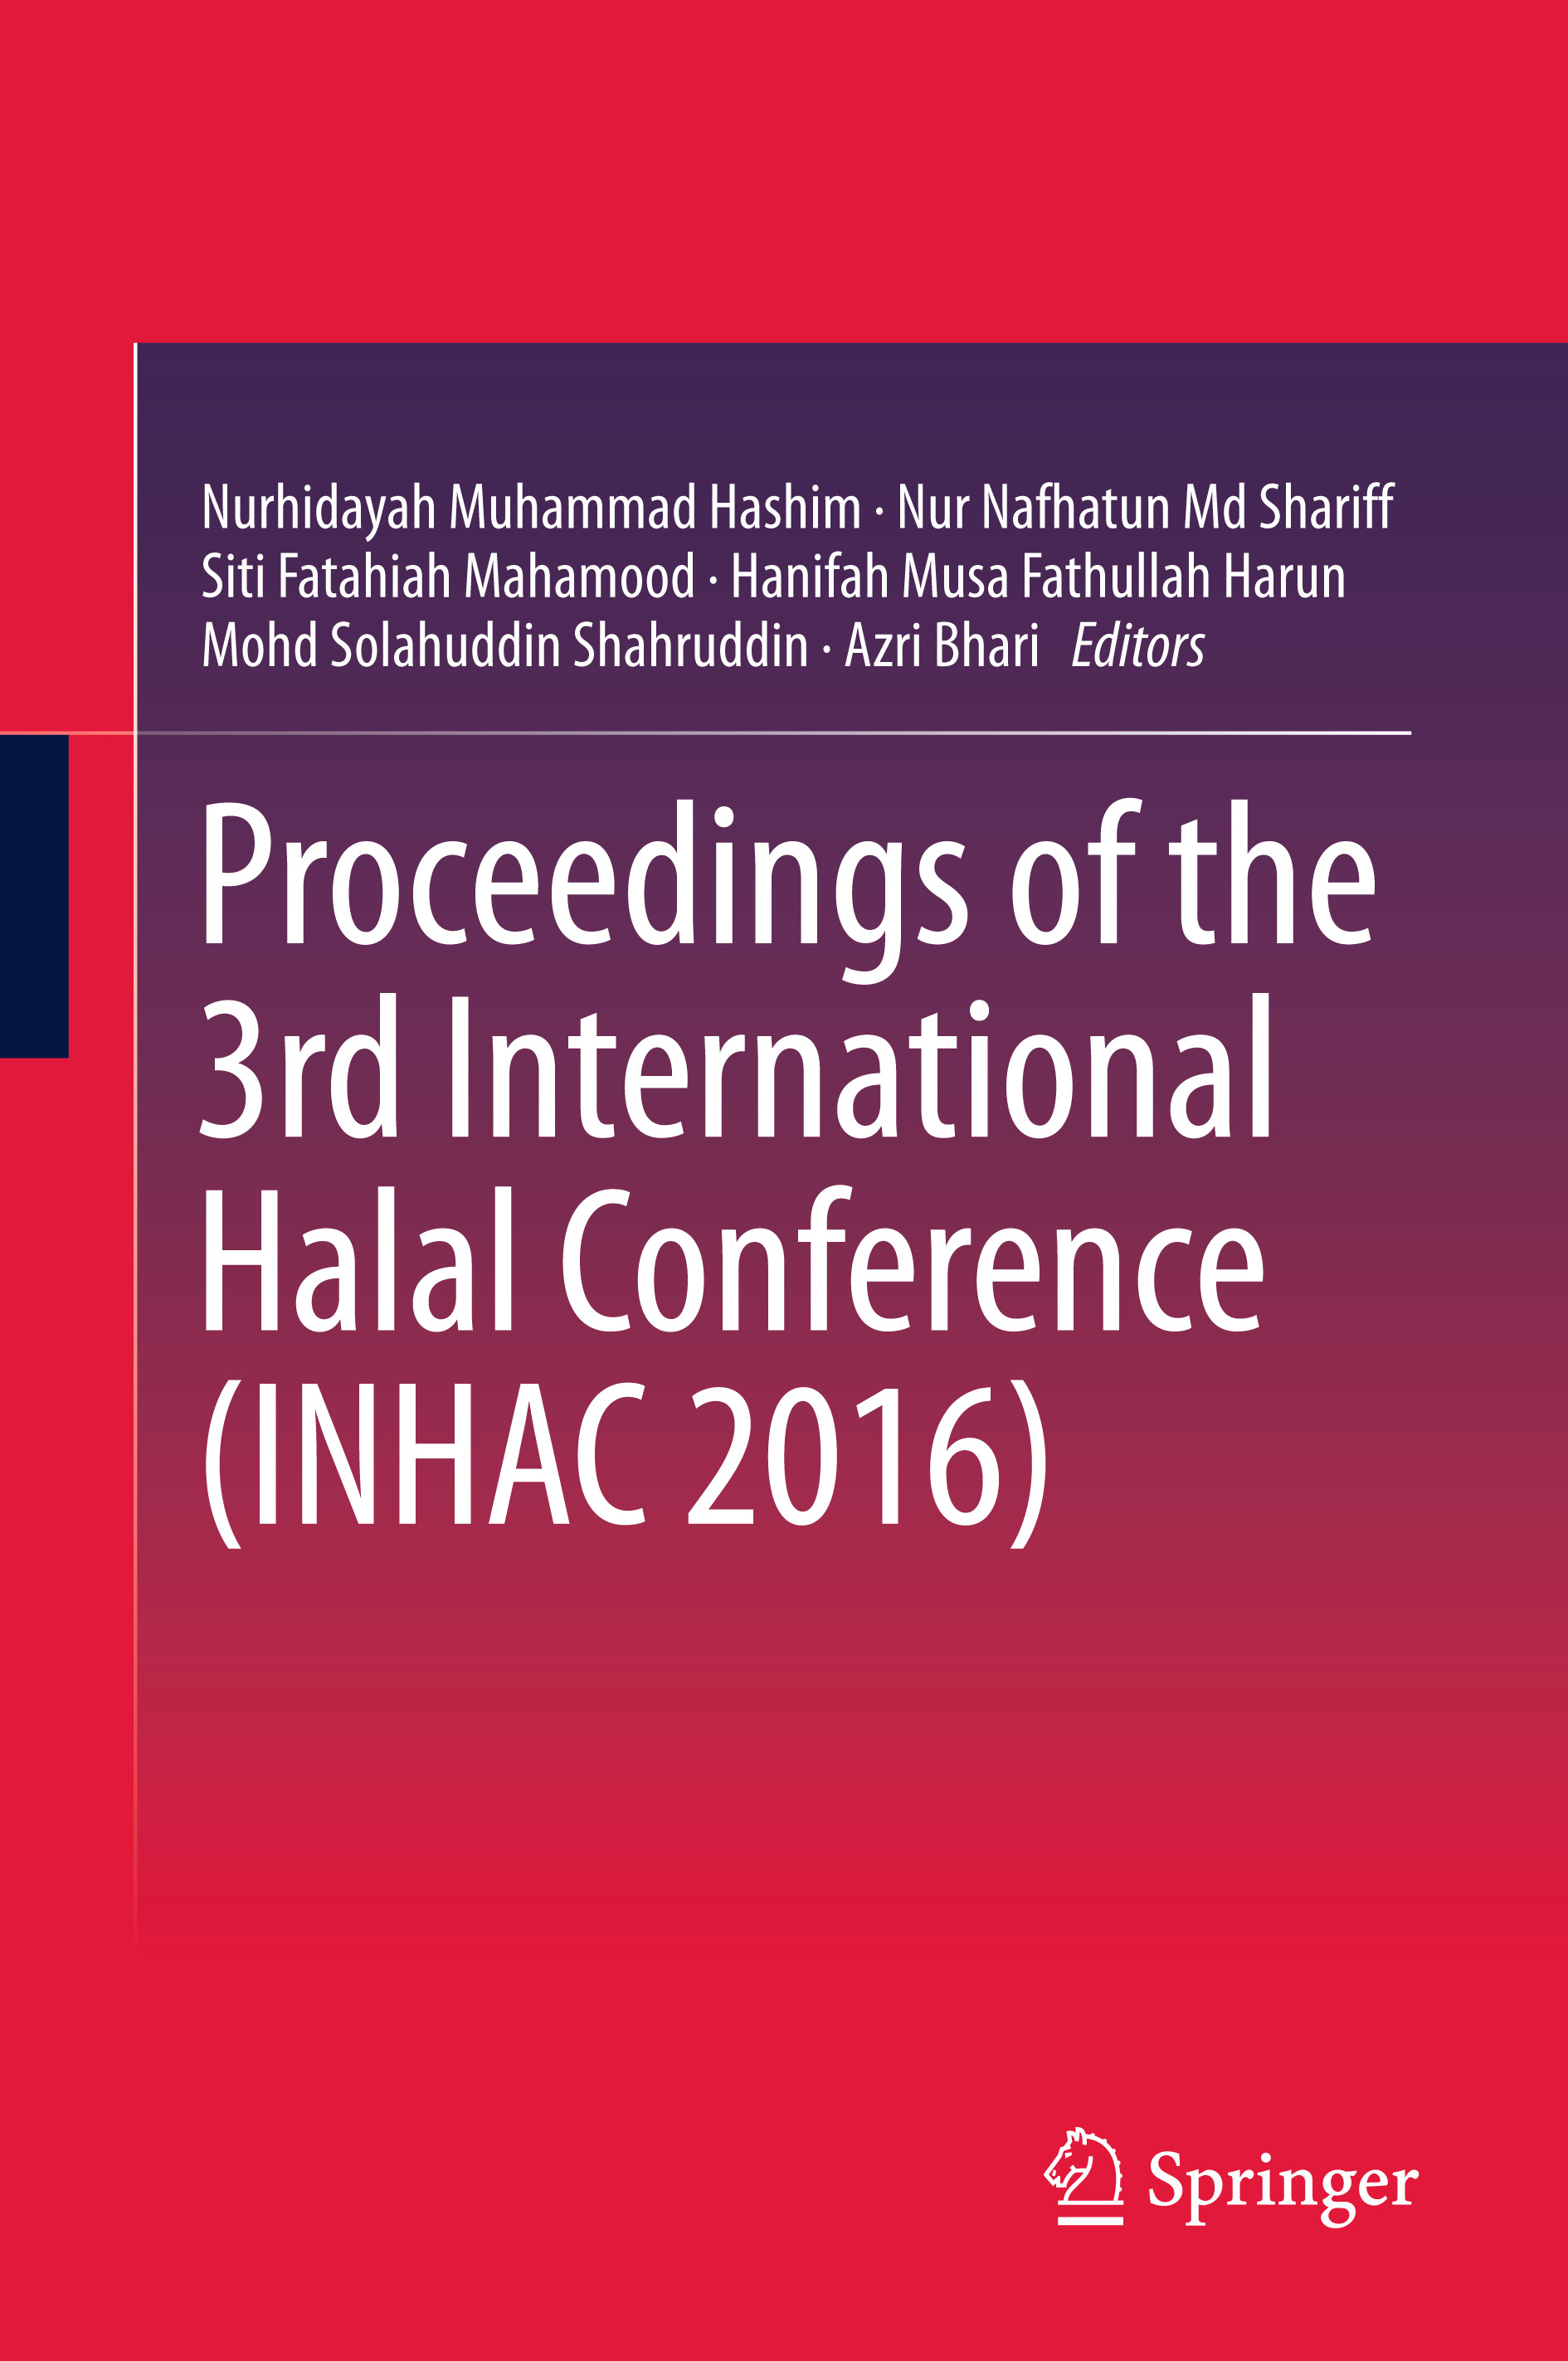 Bhari, Azri - Proceedings of the 3rd International Halal Conference (INHAC 2016), ebook